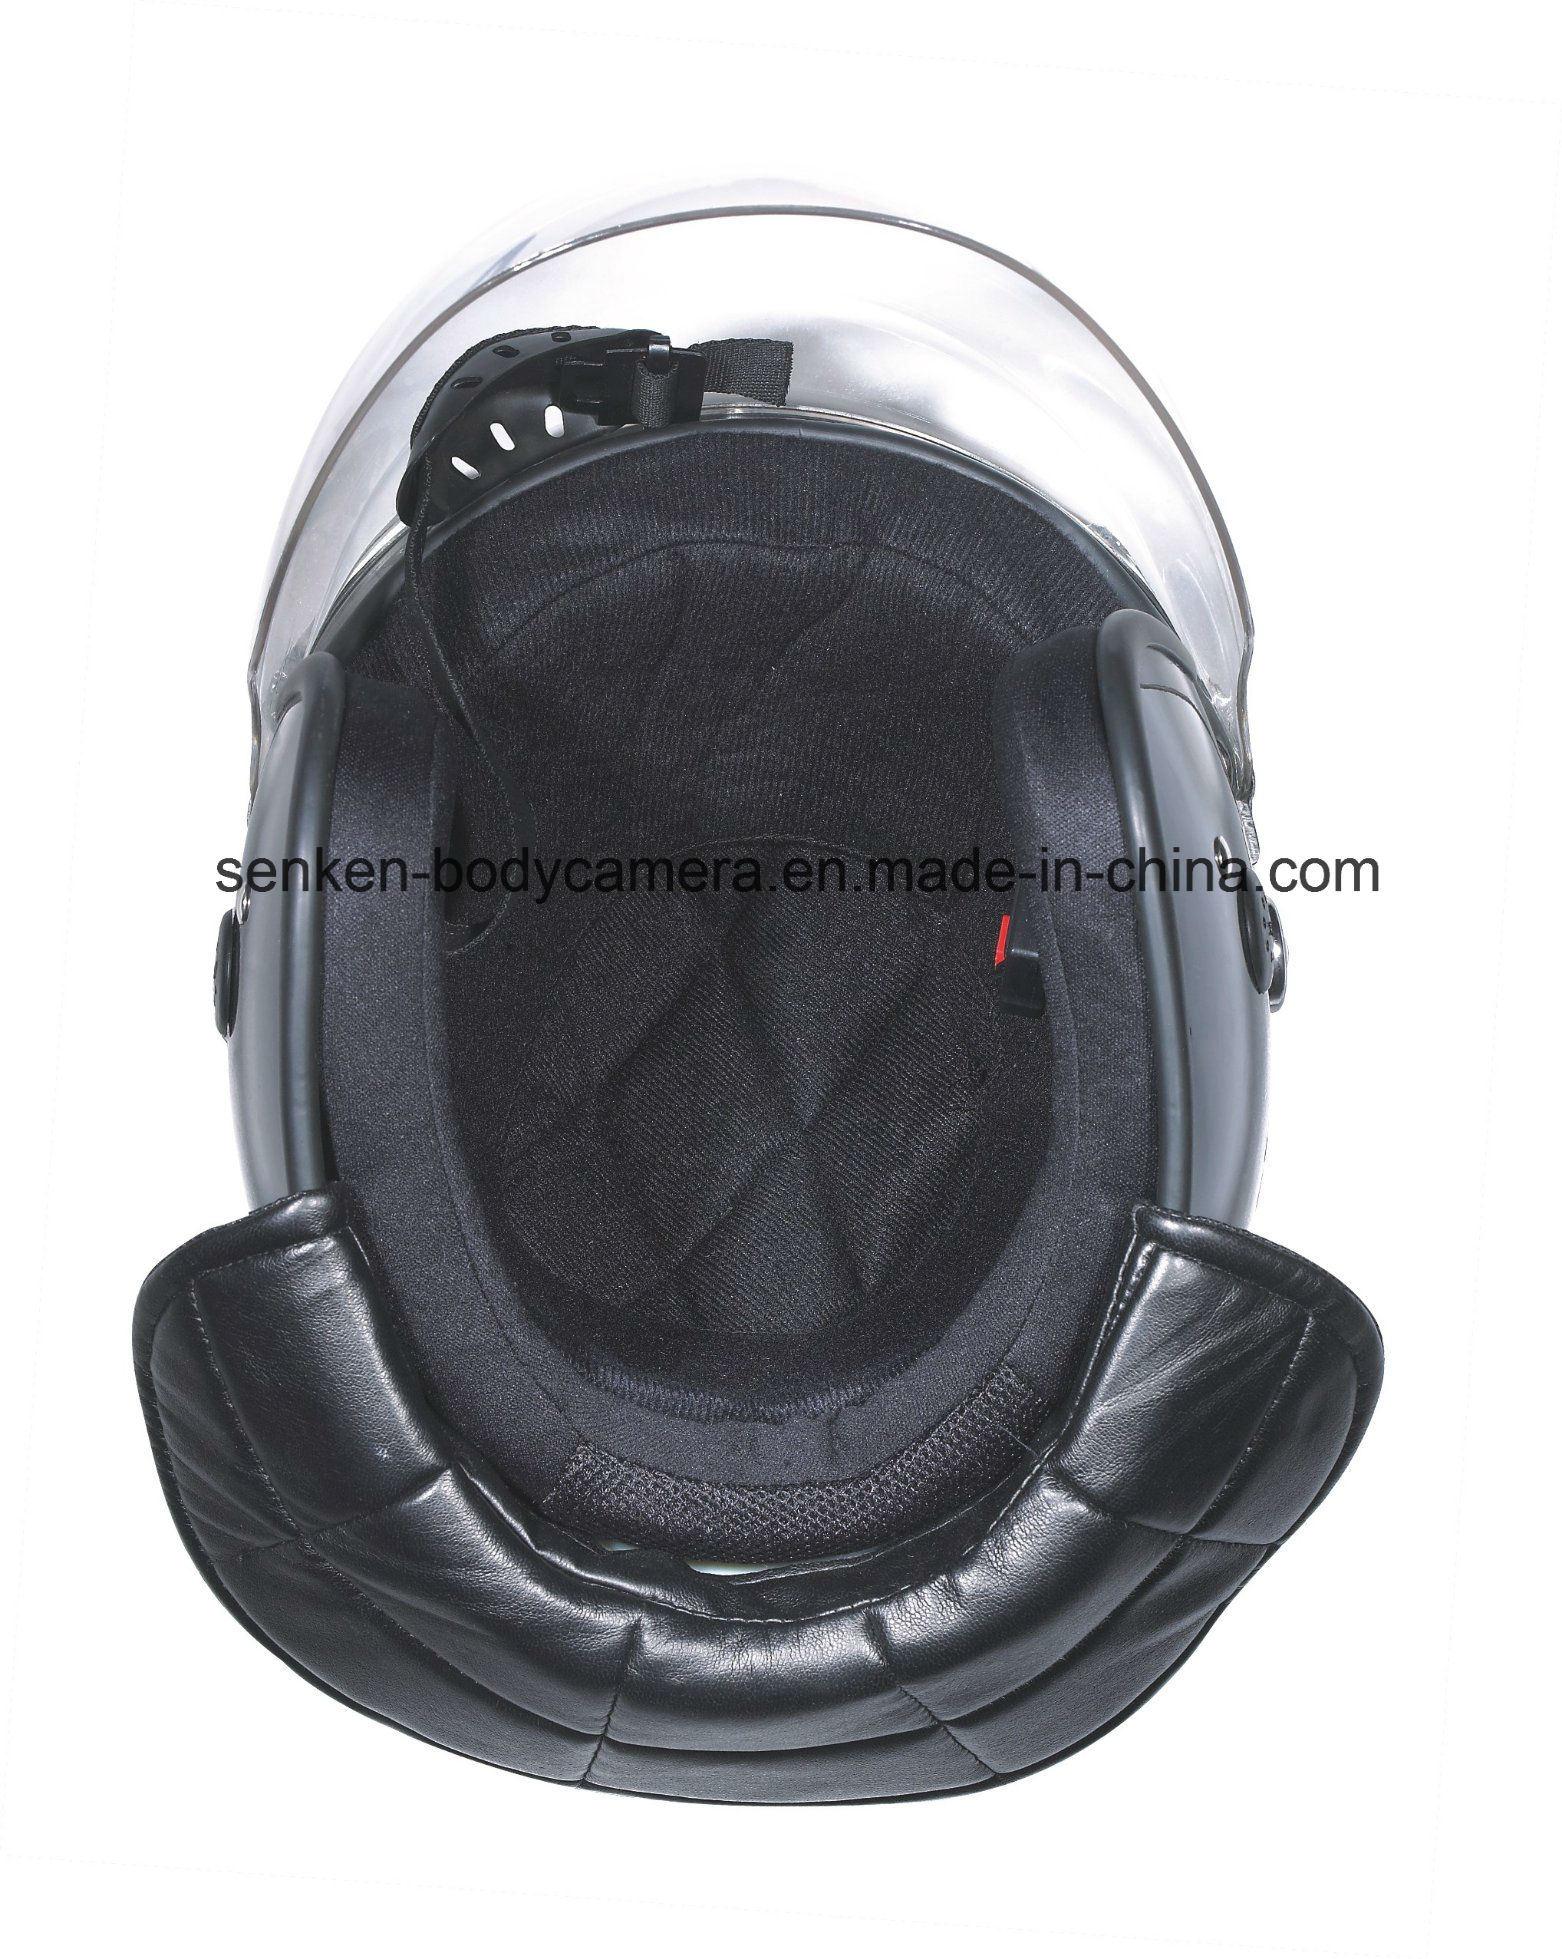 Senken ABS Material High Quality Anti-Riot Helmet